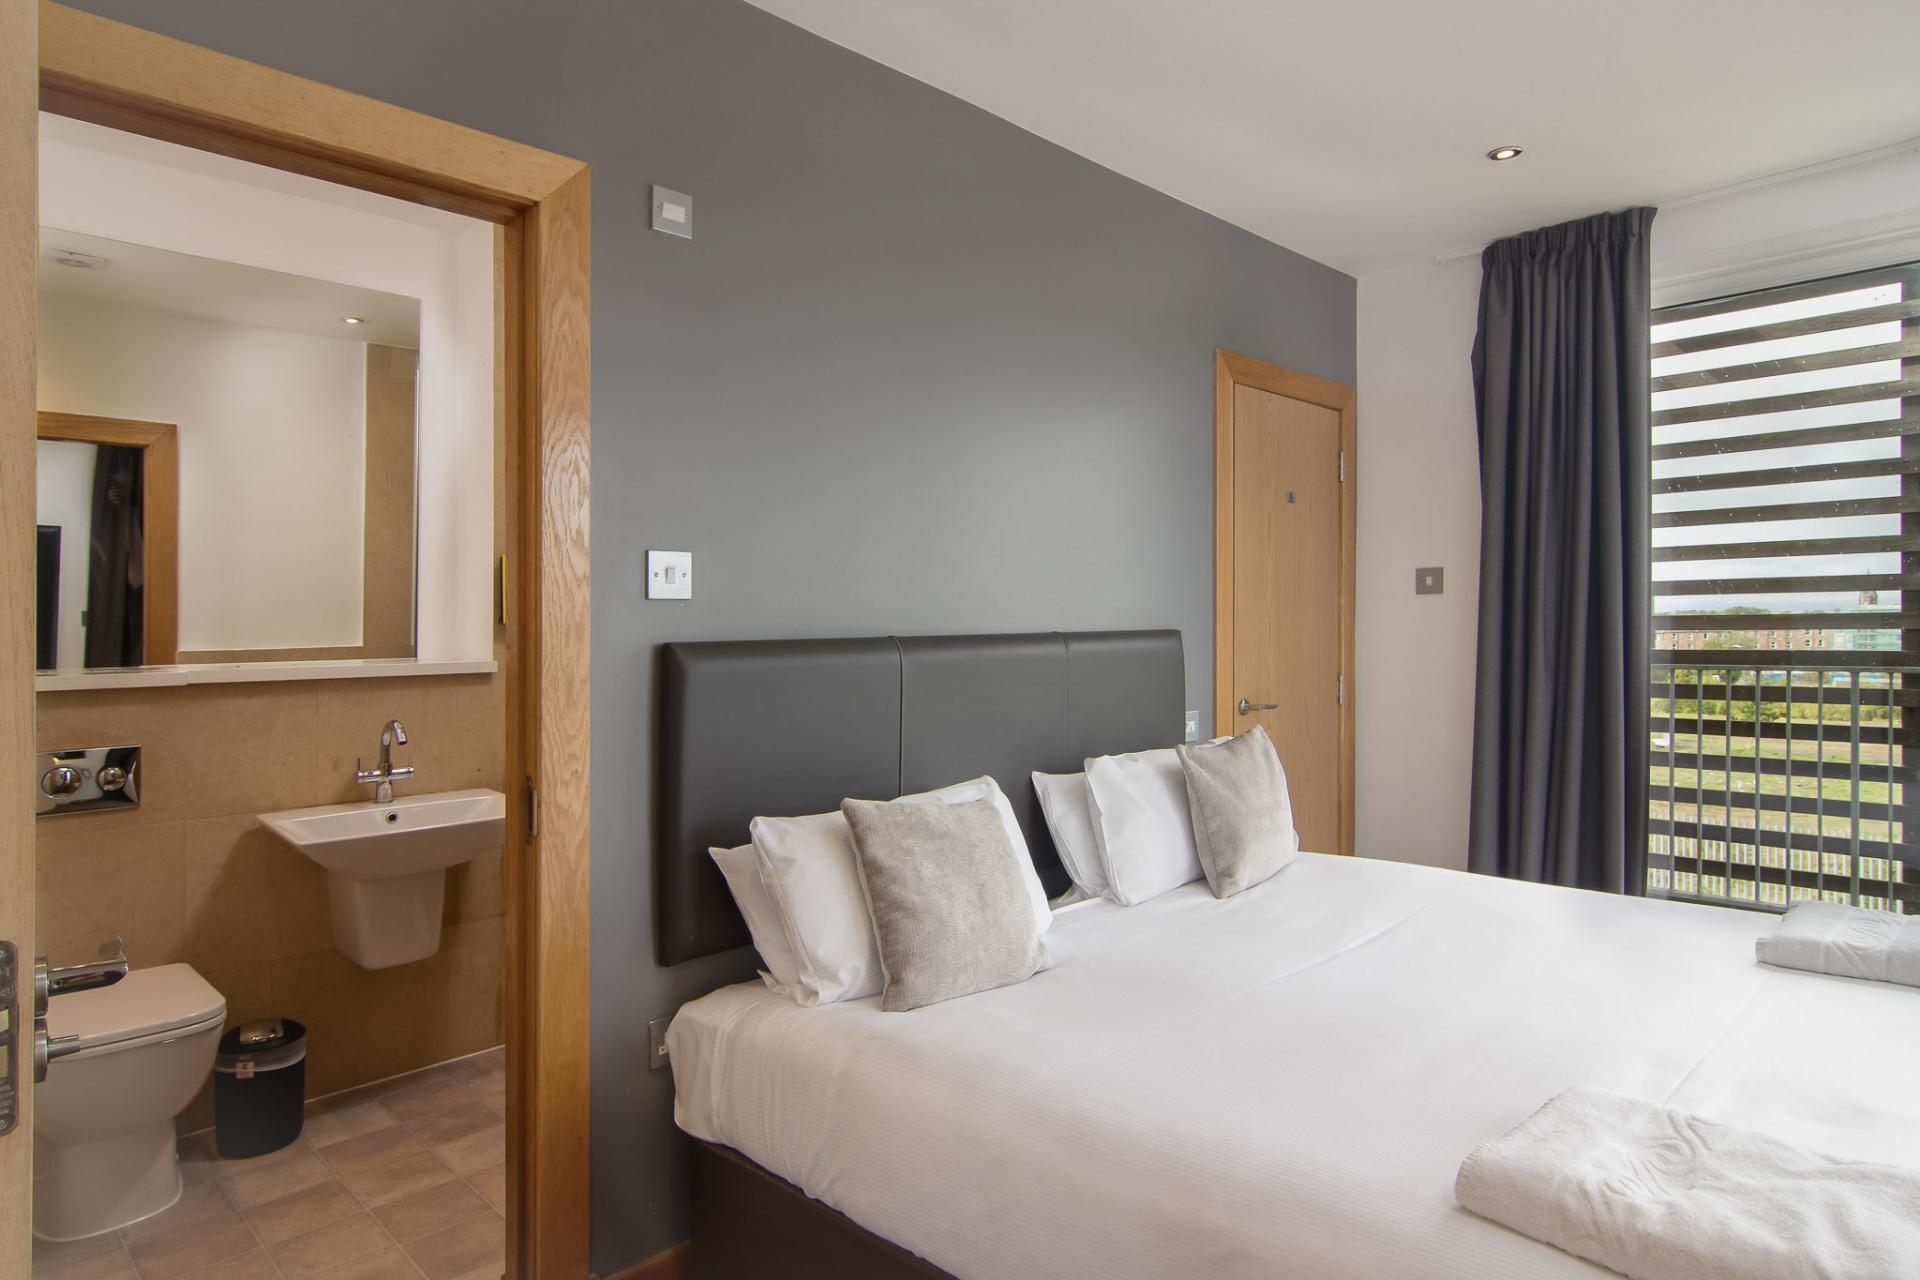 Bed at Staycity Edinburgh Leamington Wharf, Haymarket, Edinburgh